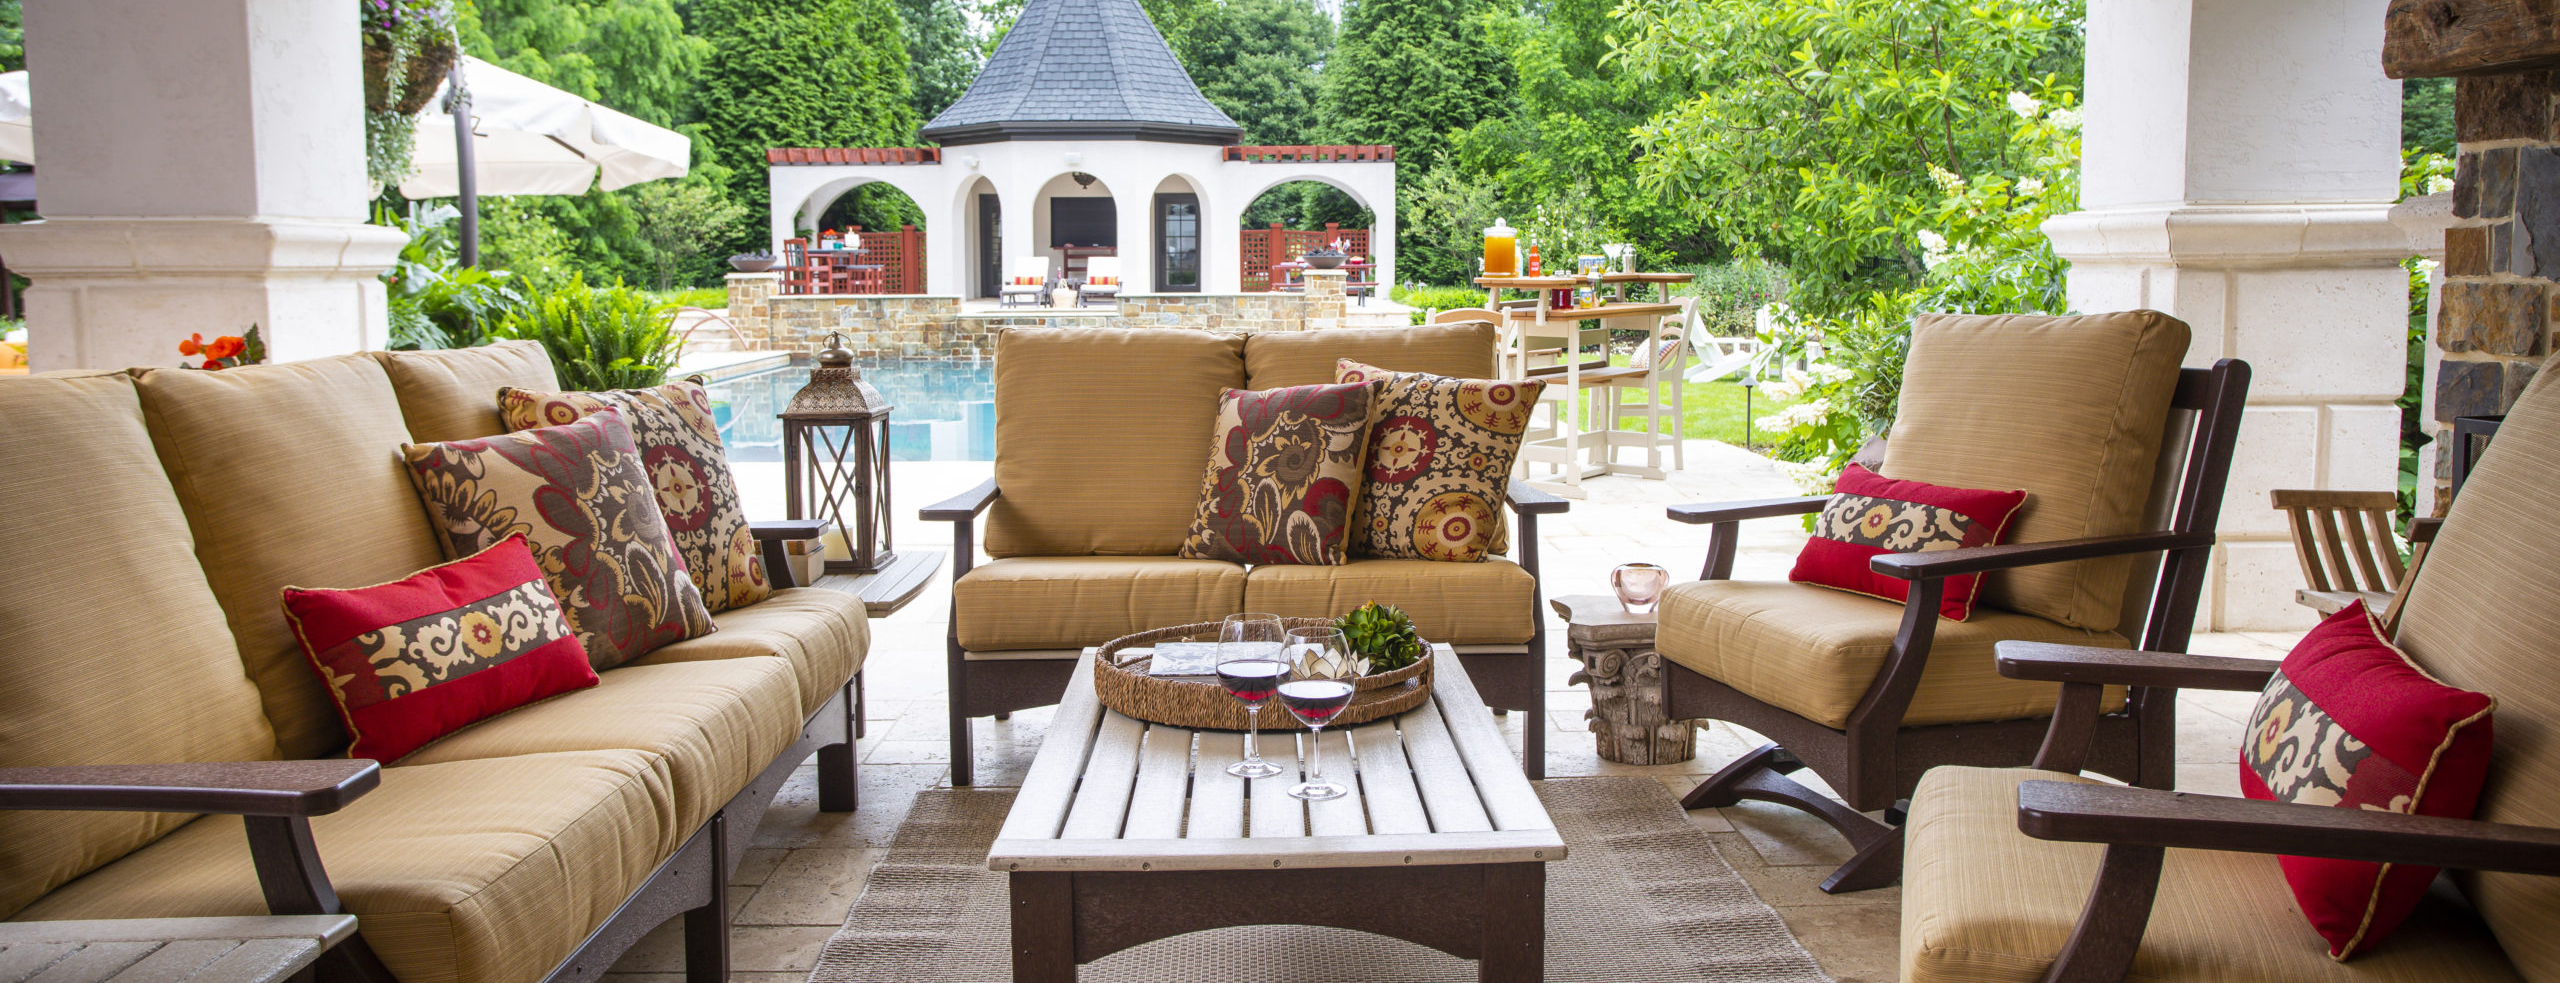 Breezesta Piedmont Love Seat Sofa Club Chair